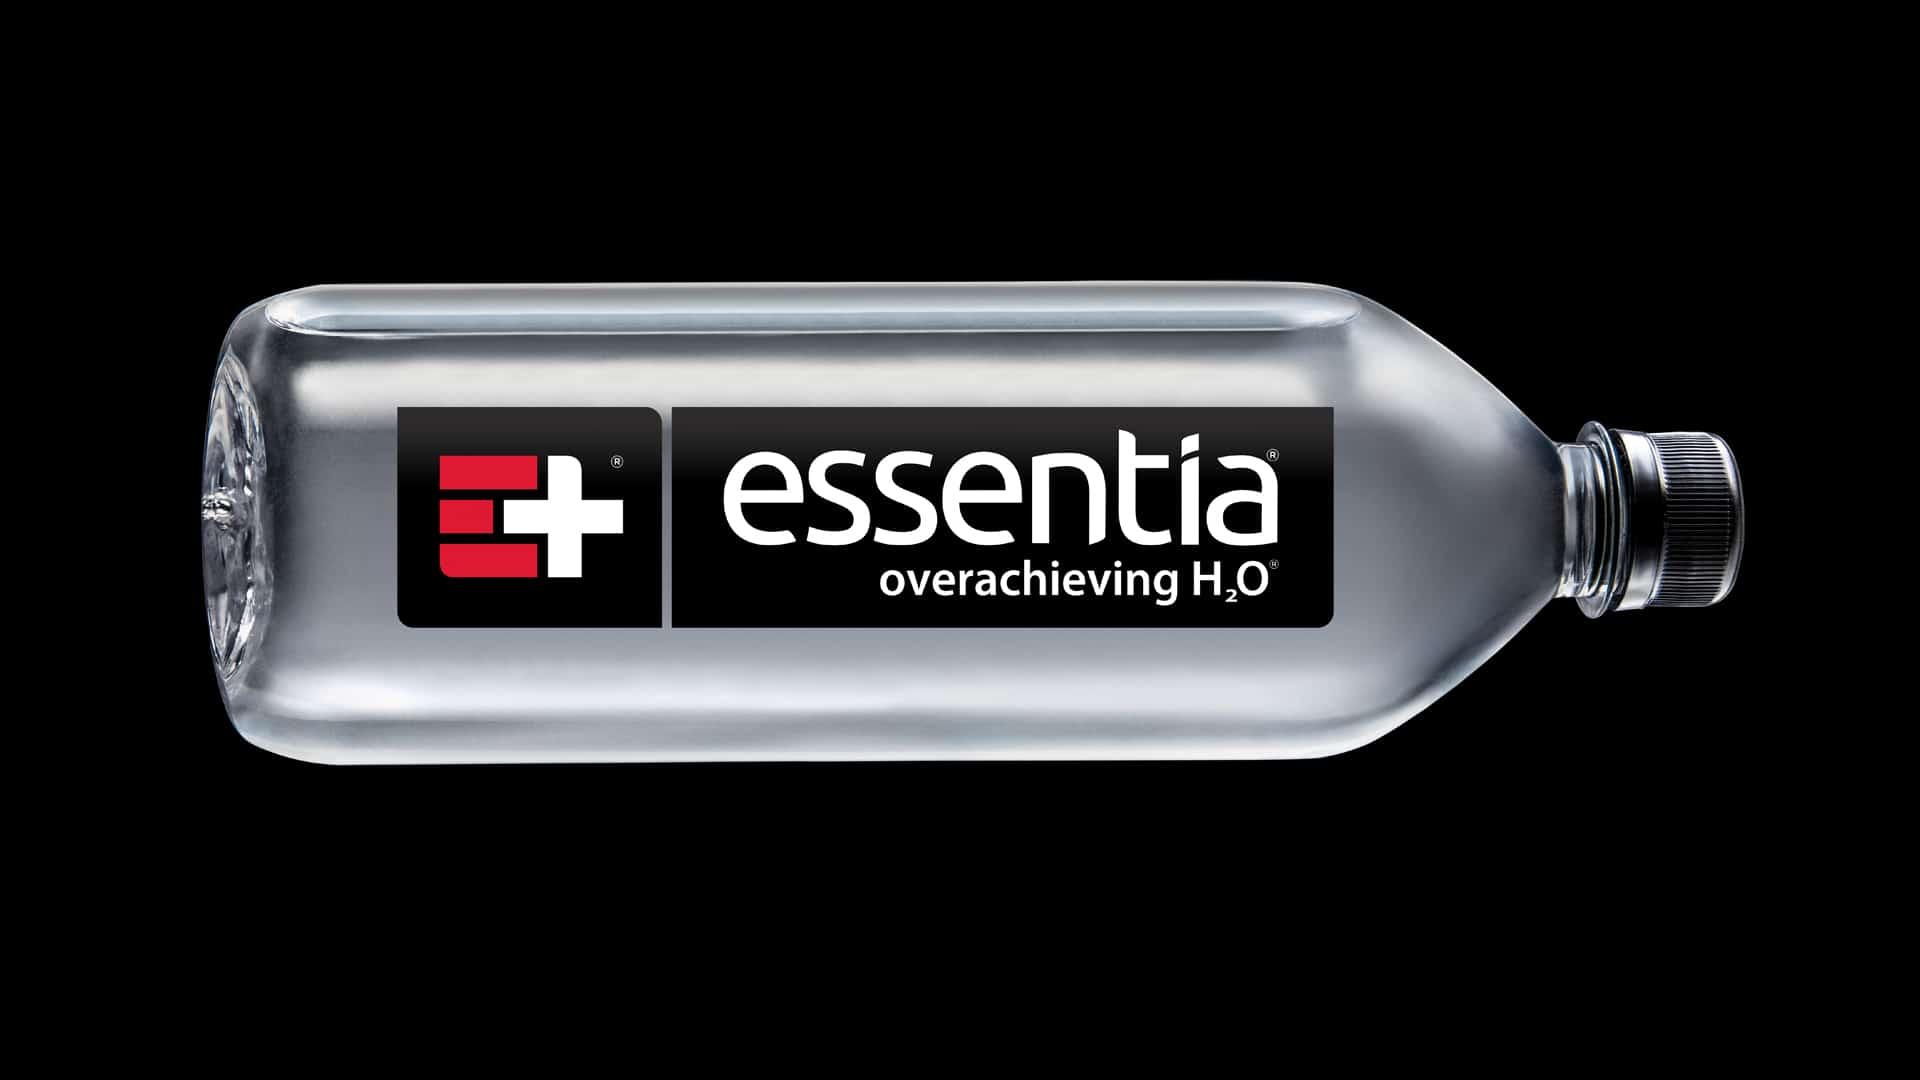 Essentia Water - Overachieving H2O